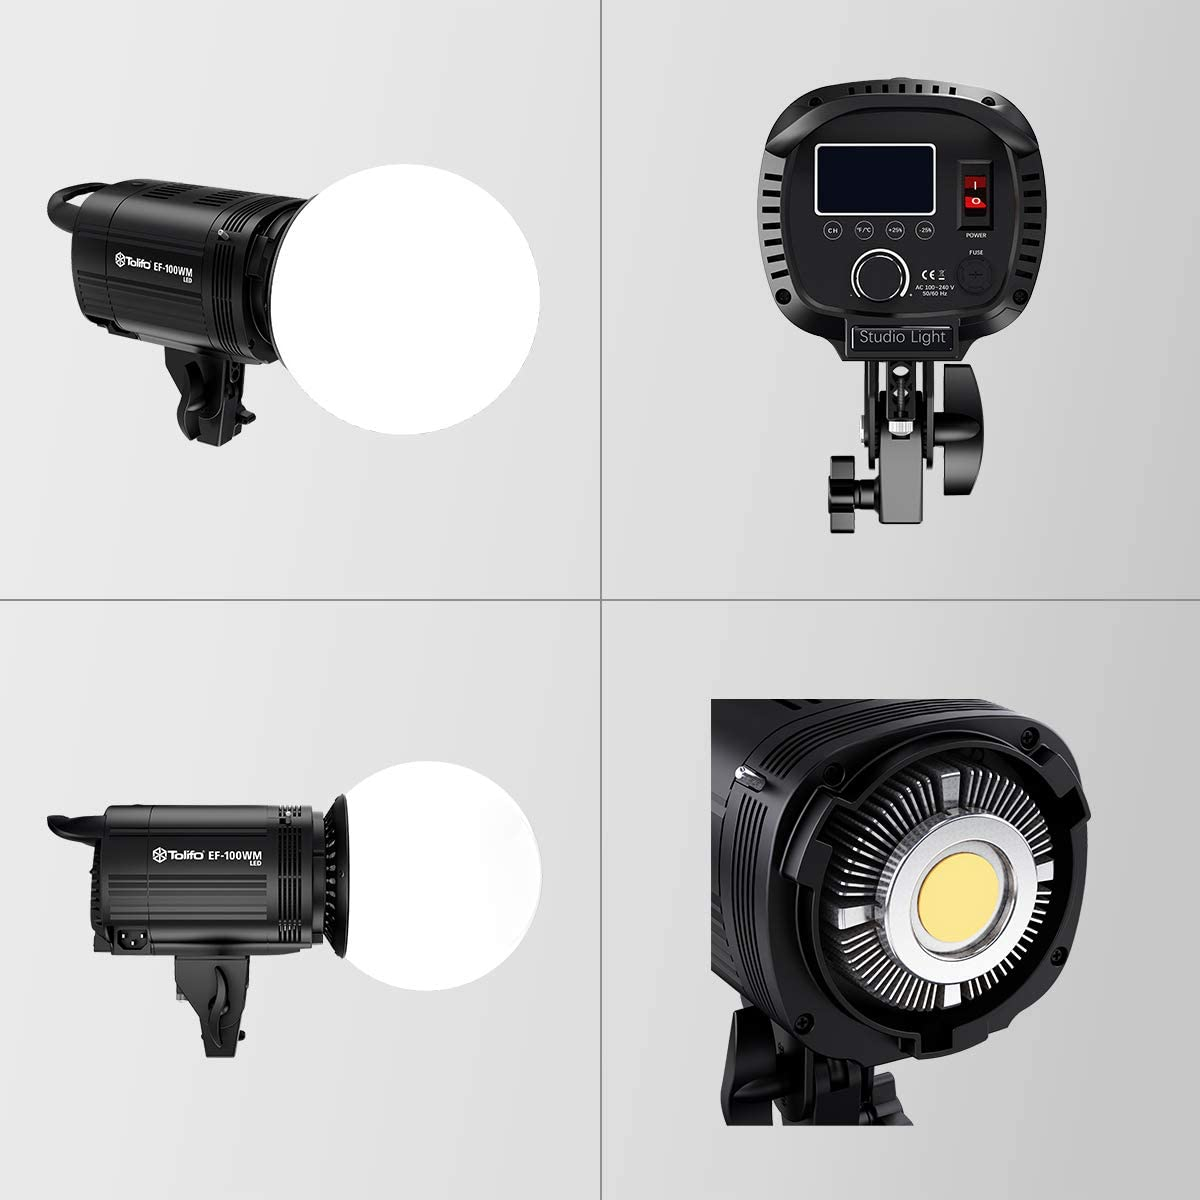 Tolifo LED Videolicht Kit 2er Pack 100W Dauerlicht 5600K CRI 95+ ...